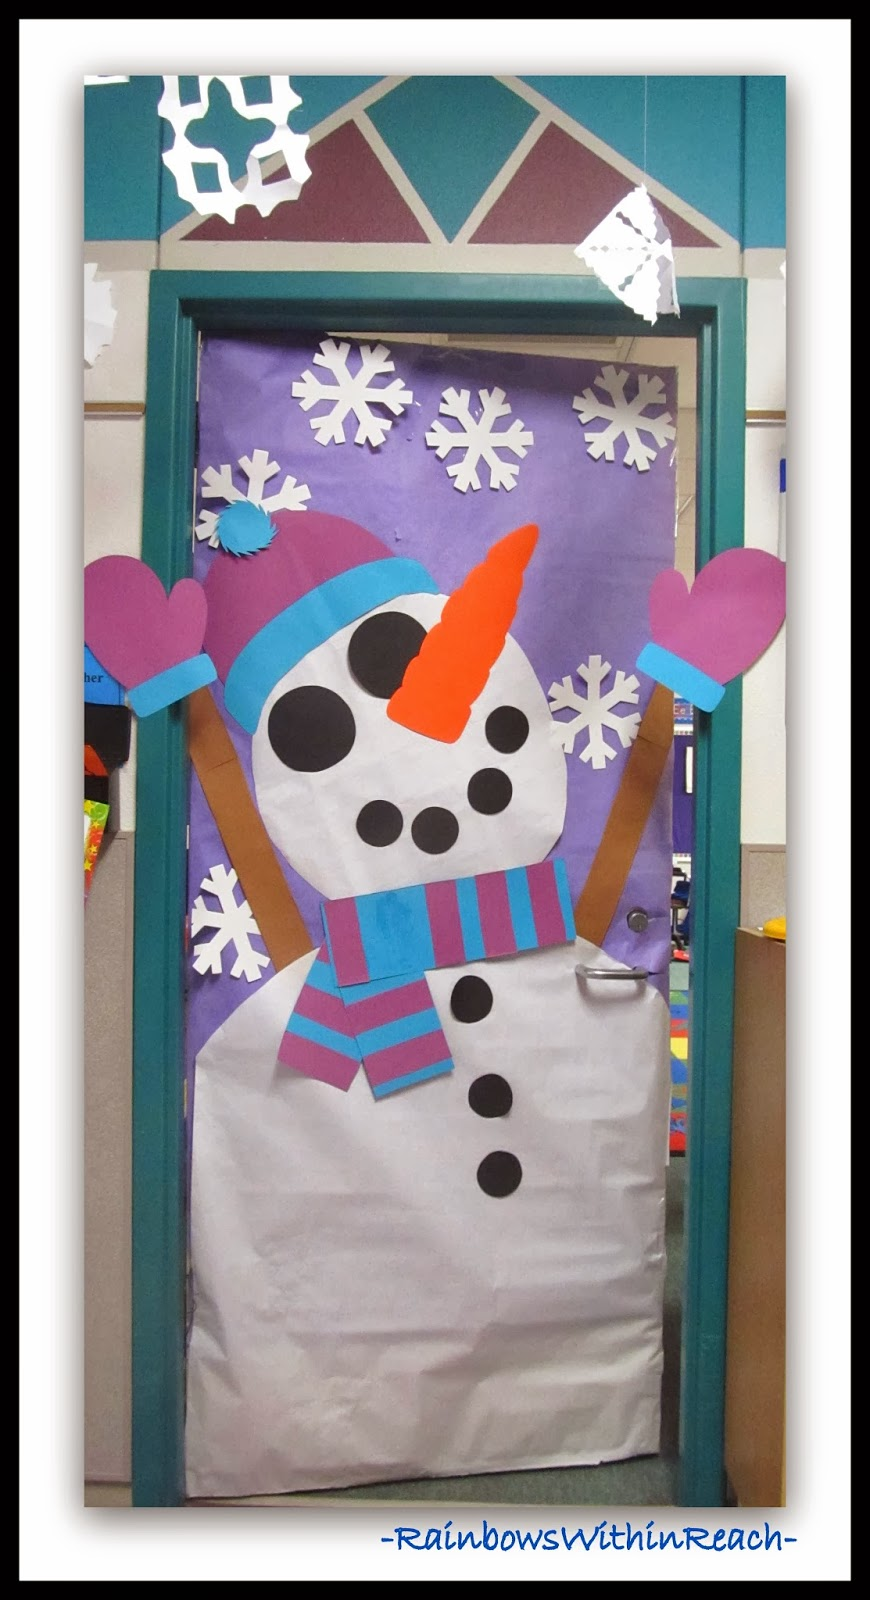 Snowman Decorated Classroom Door Via Rainbowswithinreach